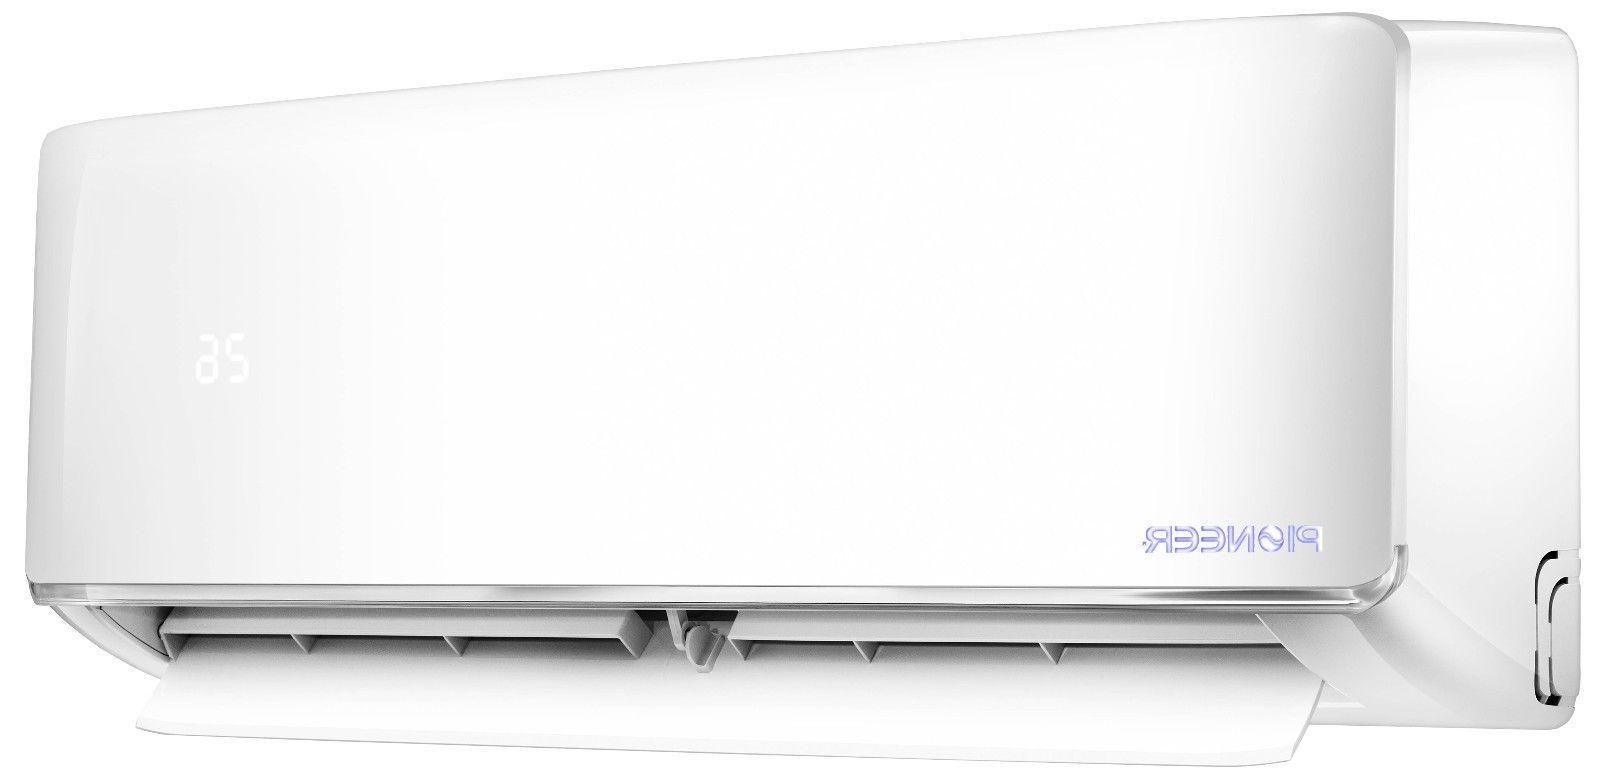 PIONEER 12000 17.5 SEER Inverter+ Ductless Mini Split Heat Set 230V